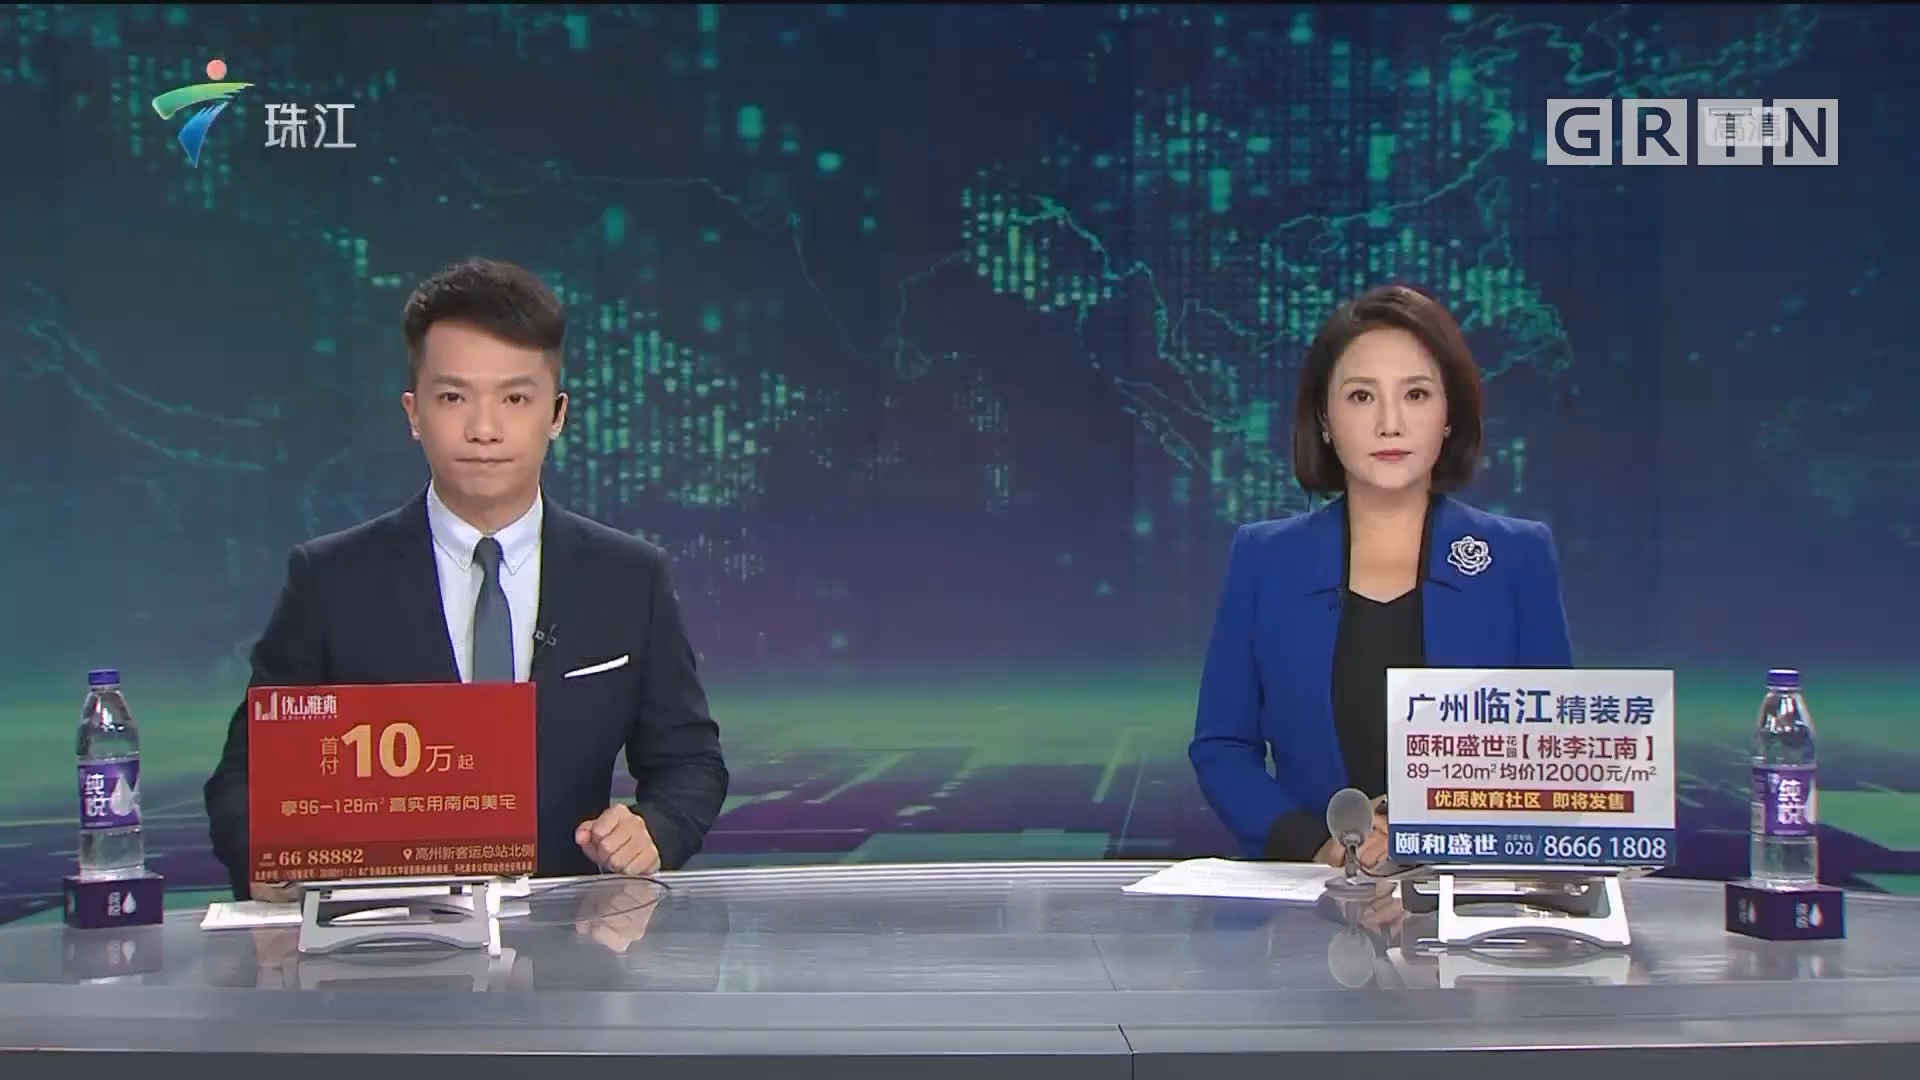 [HD][2019-10-16]珠江新聞眼:海博會:新款海洋藥物有望治療老年癡呆